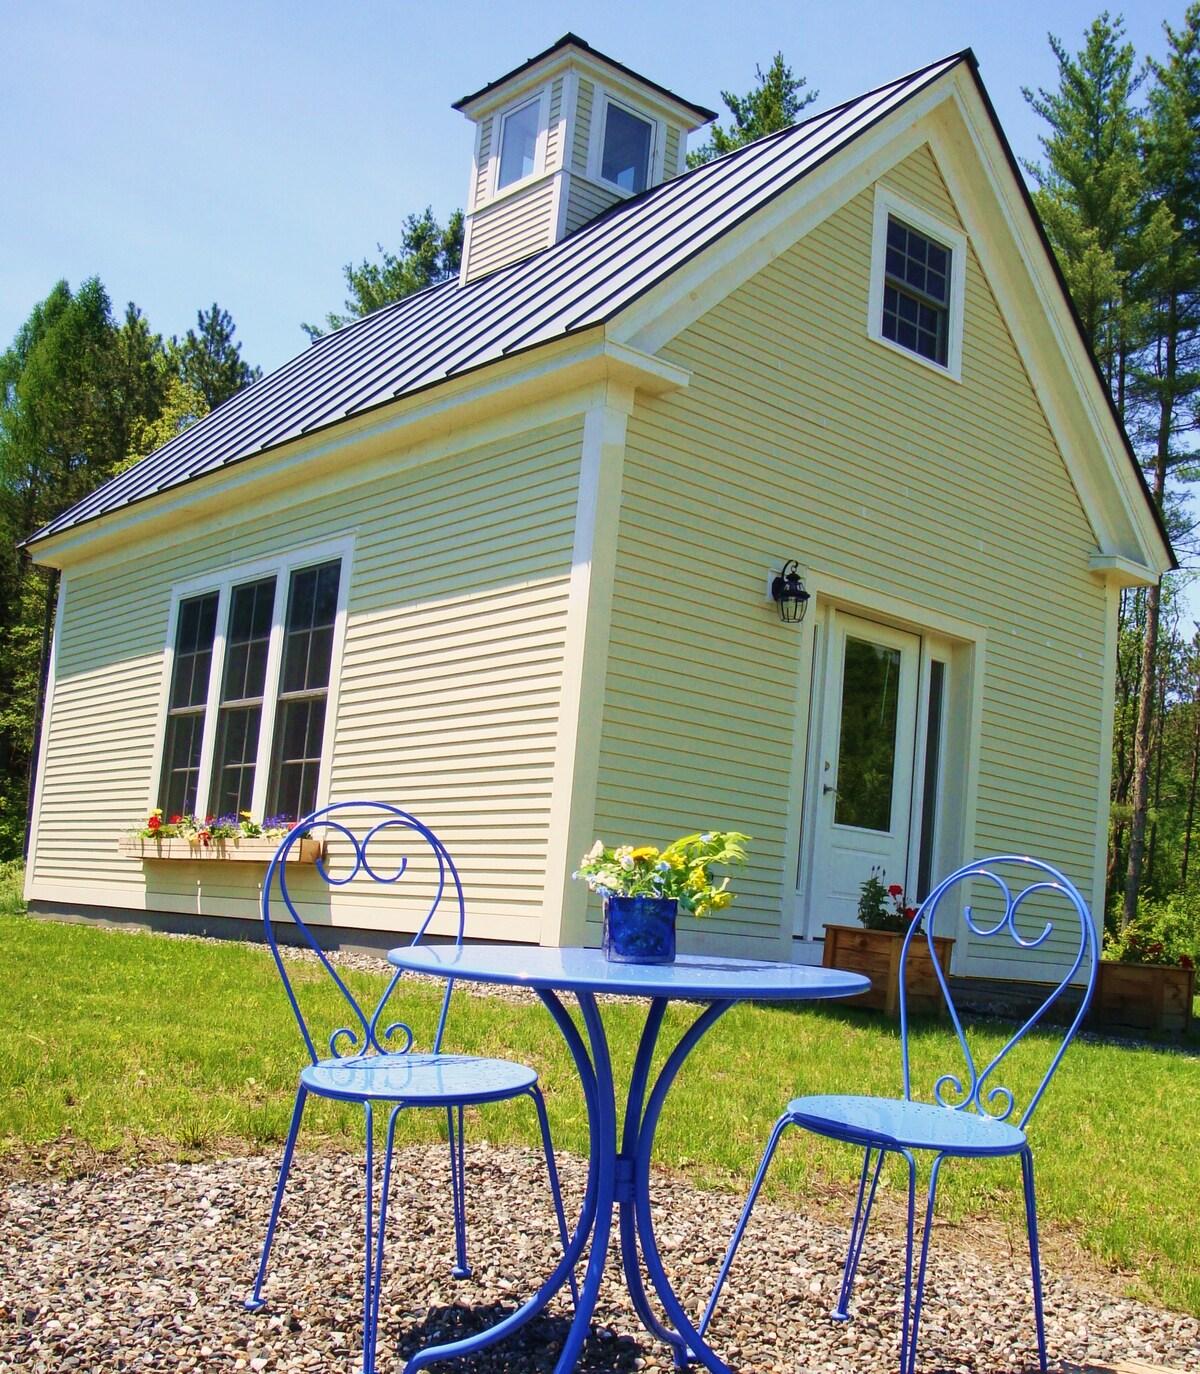 Charming Schoolhouse Retreat